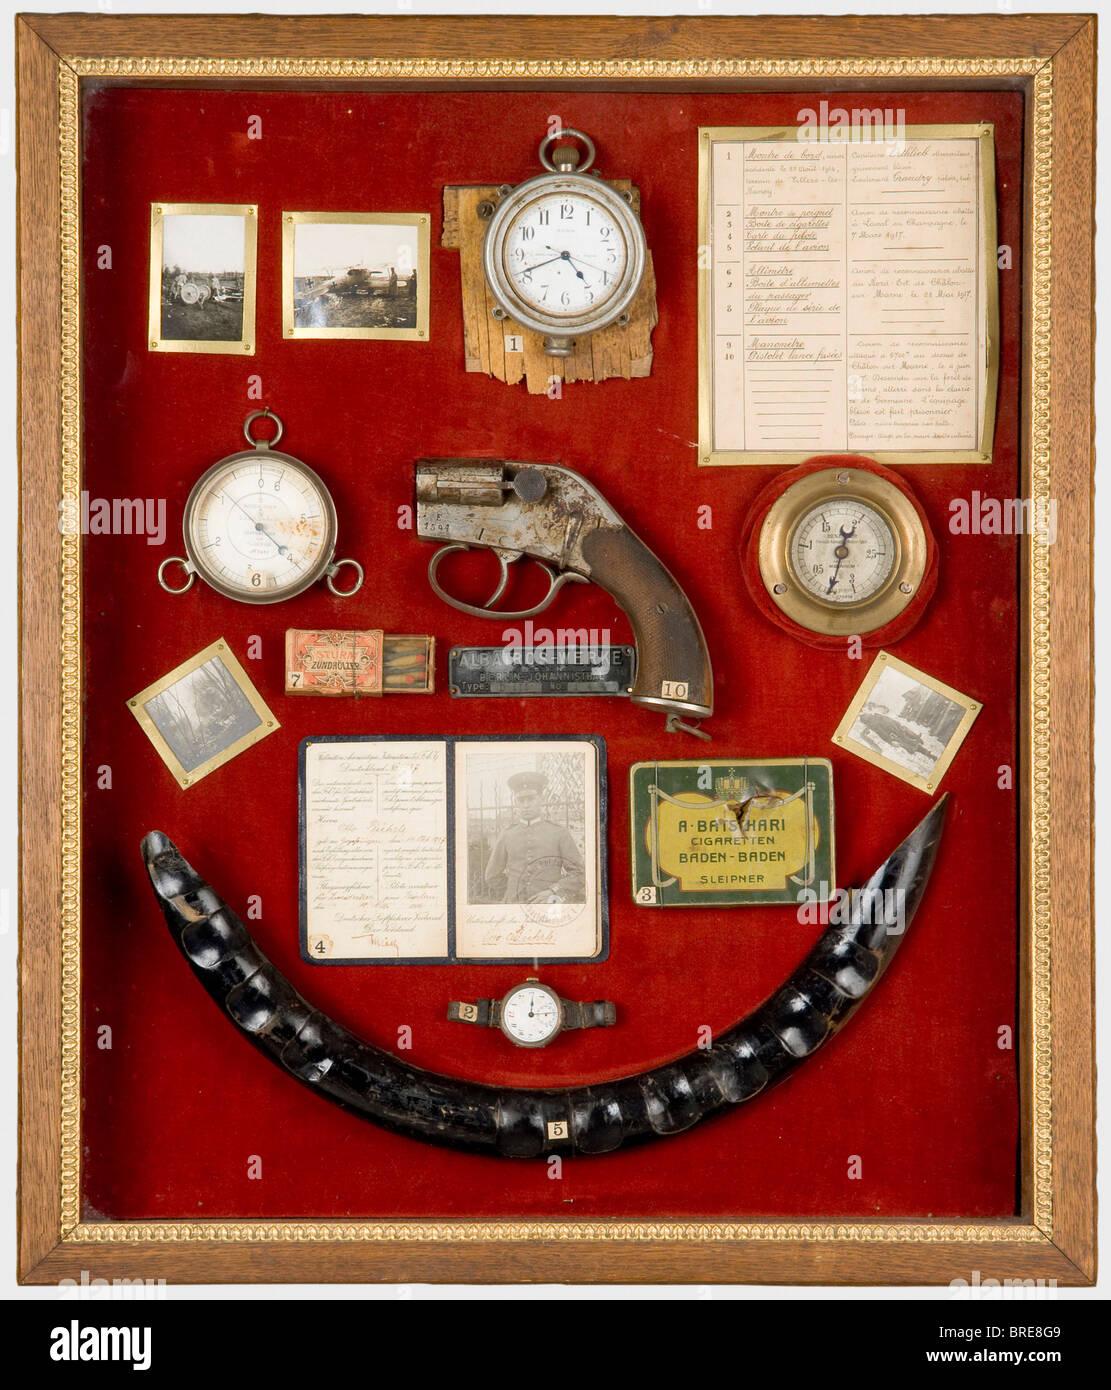 Armand Pinsard (1887 - 1953), a display case with war mementos Wall display case with ten mementos of Pinsard's - Stock Image